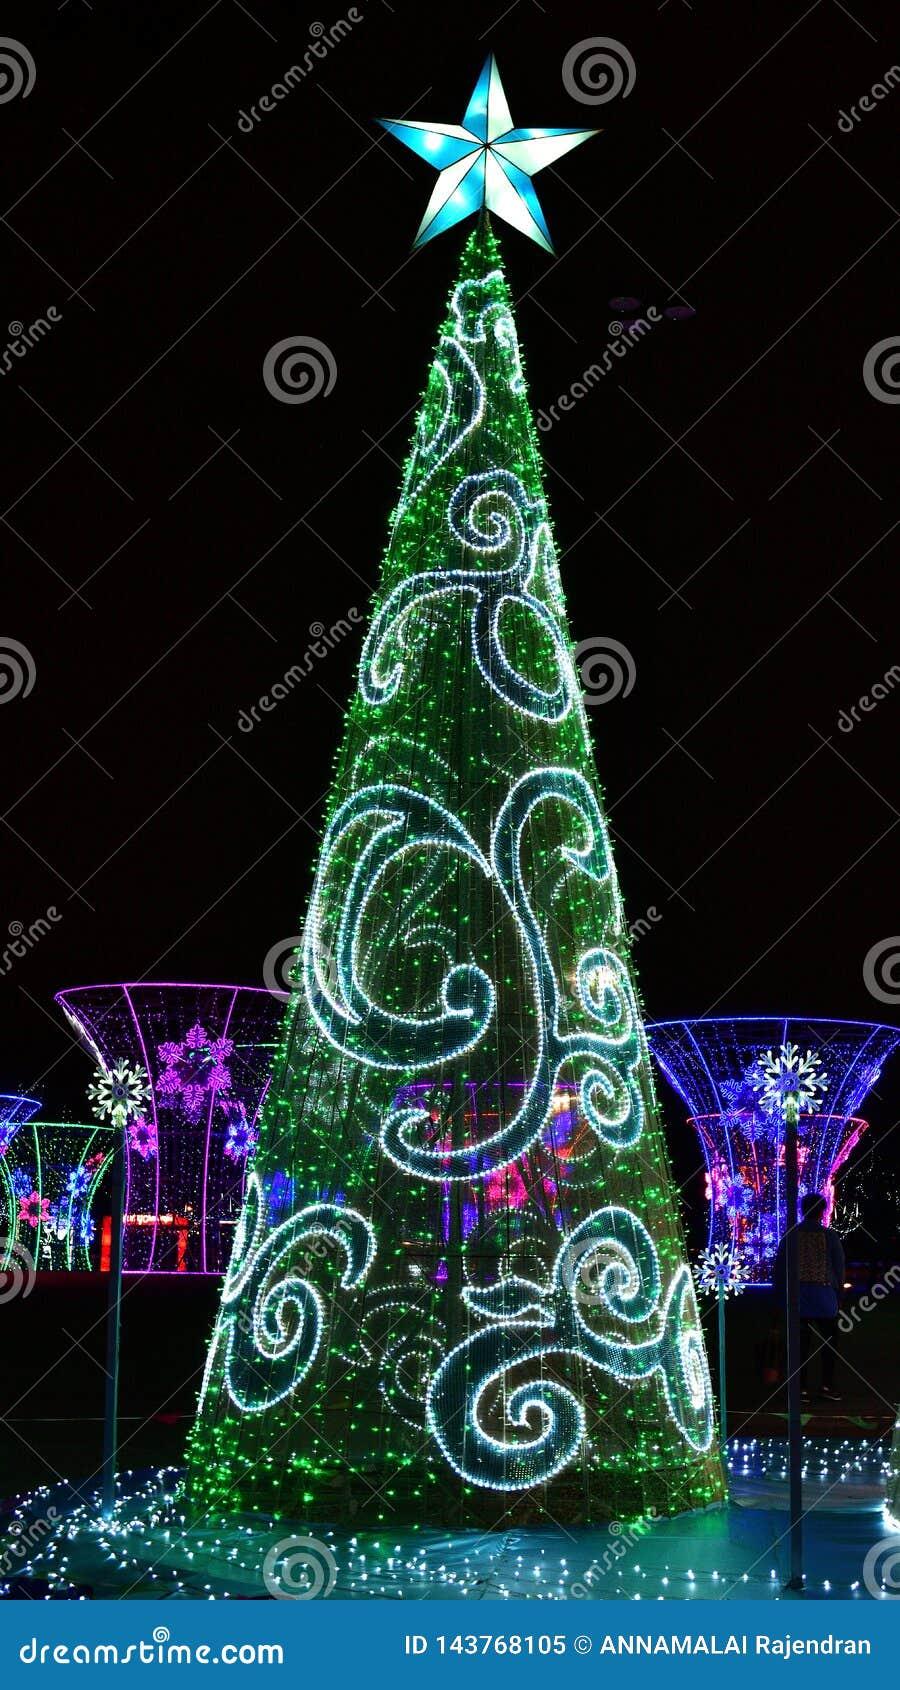 Winter Christmas decorative Lights display of Christmas Tree